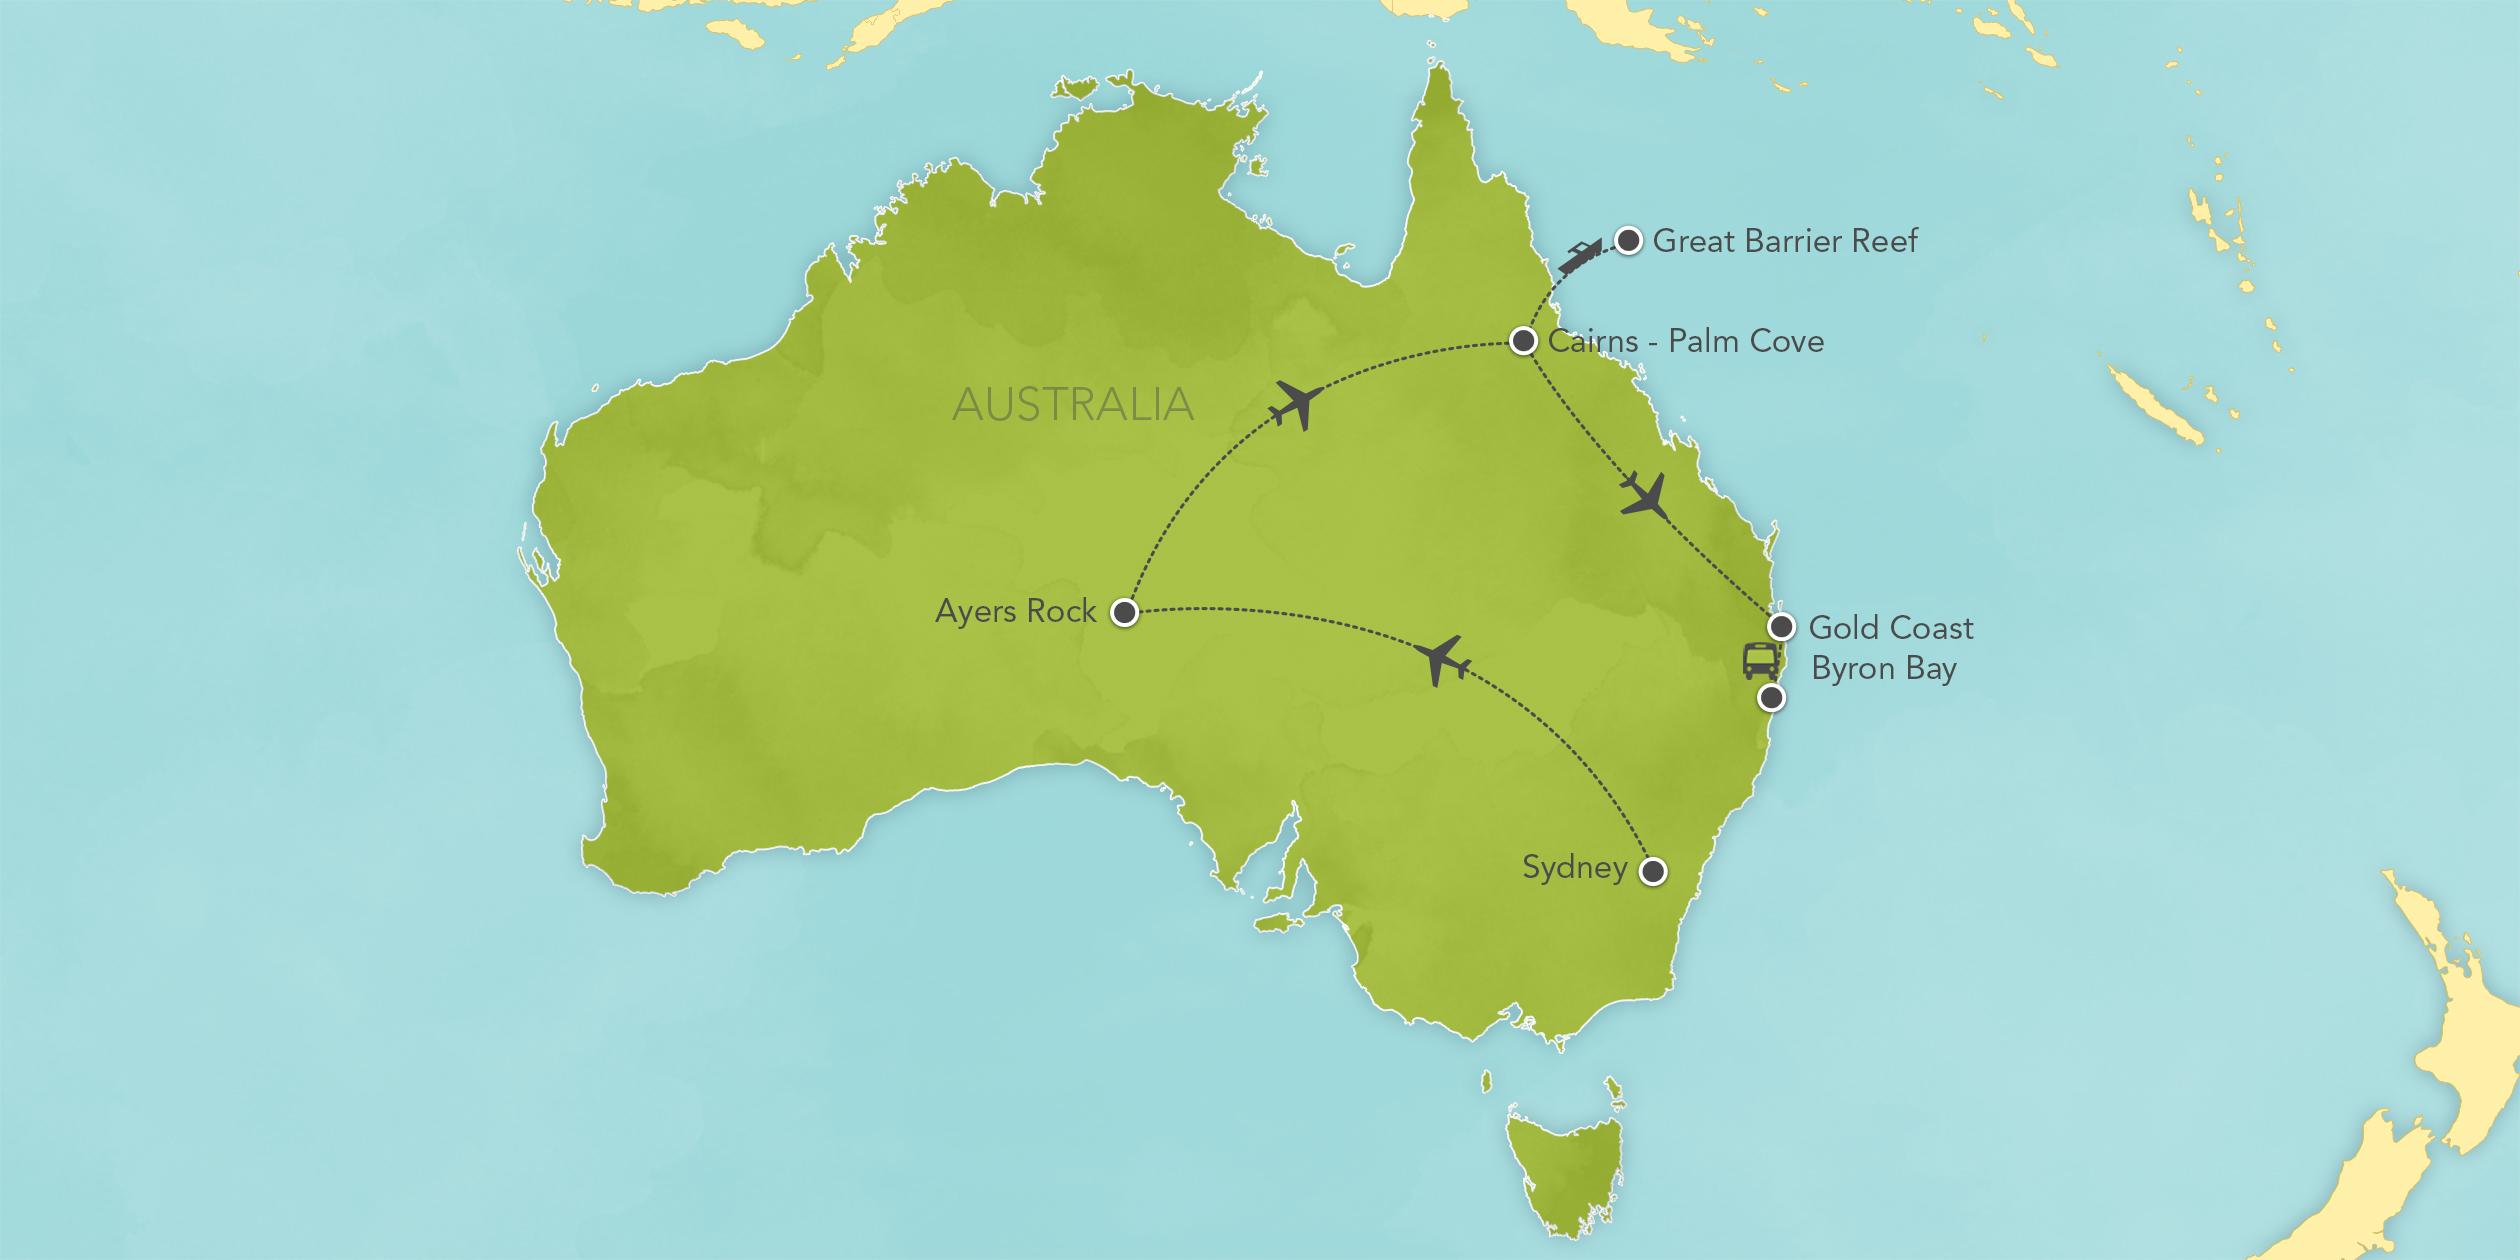 Itinerary map of Australia: Sydney, Ayers Rock, Tasmania & Great Barrier Reef 2017>